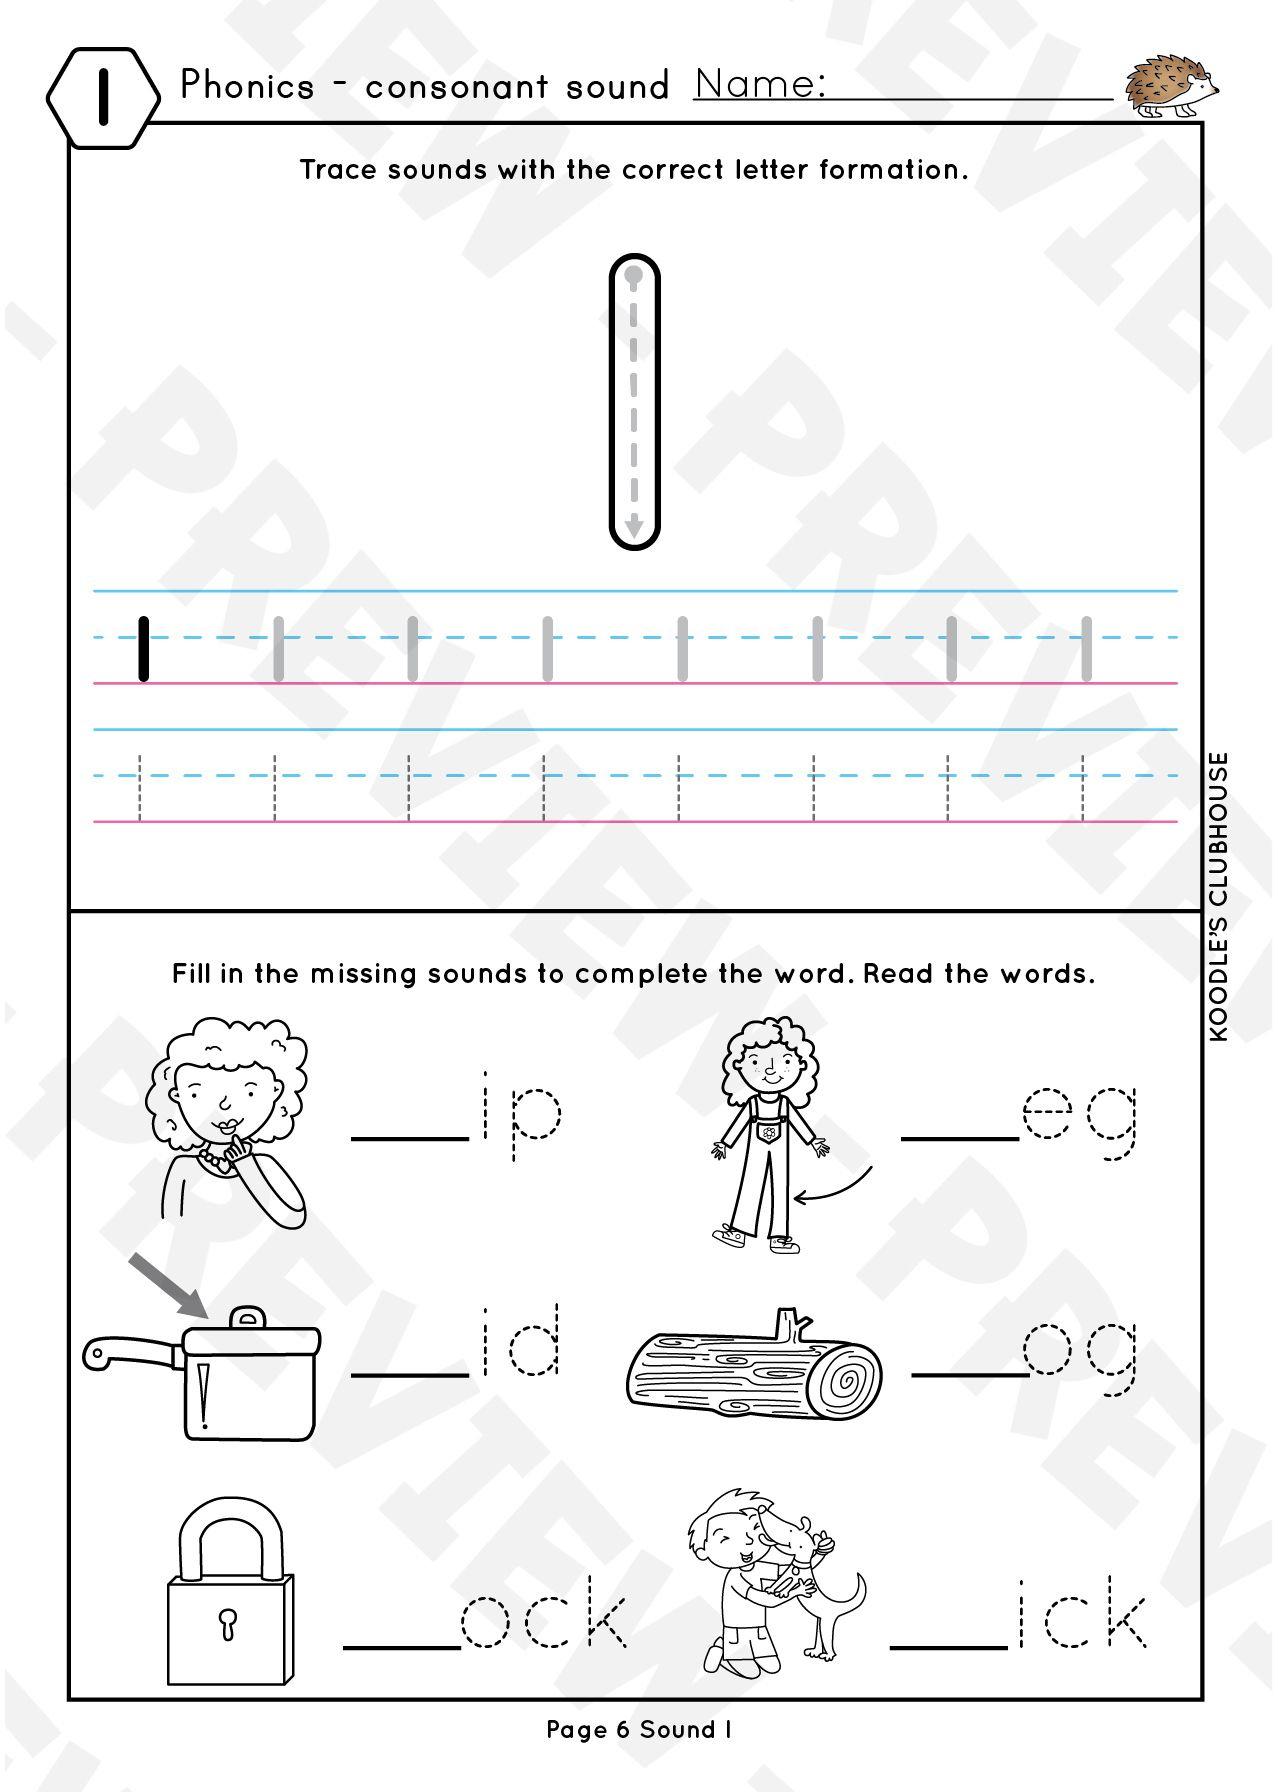 Phonics Satpin Worksheets | Phonics, Pencil Skills, Letter